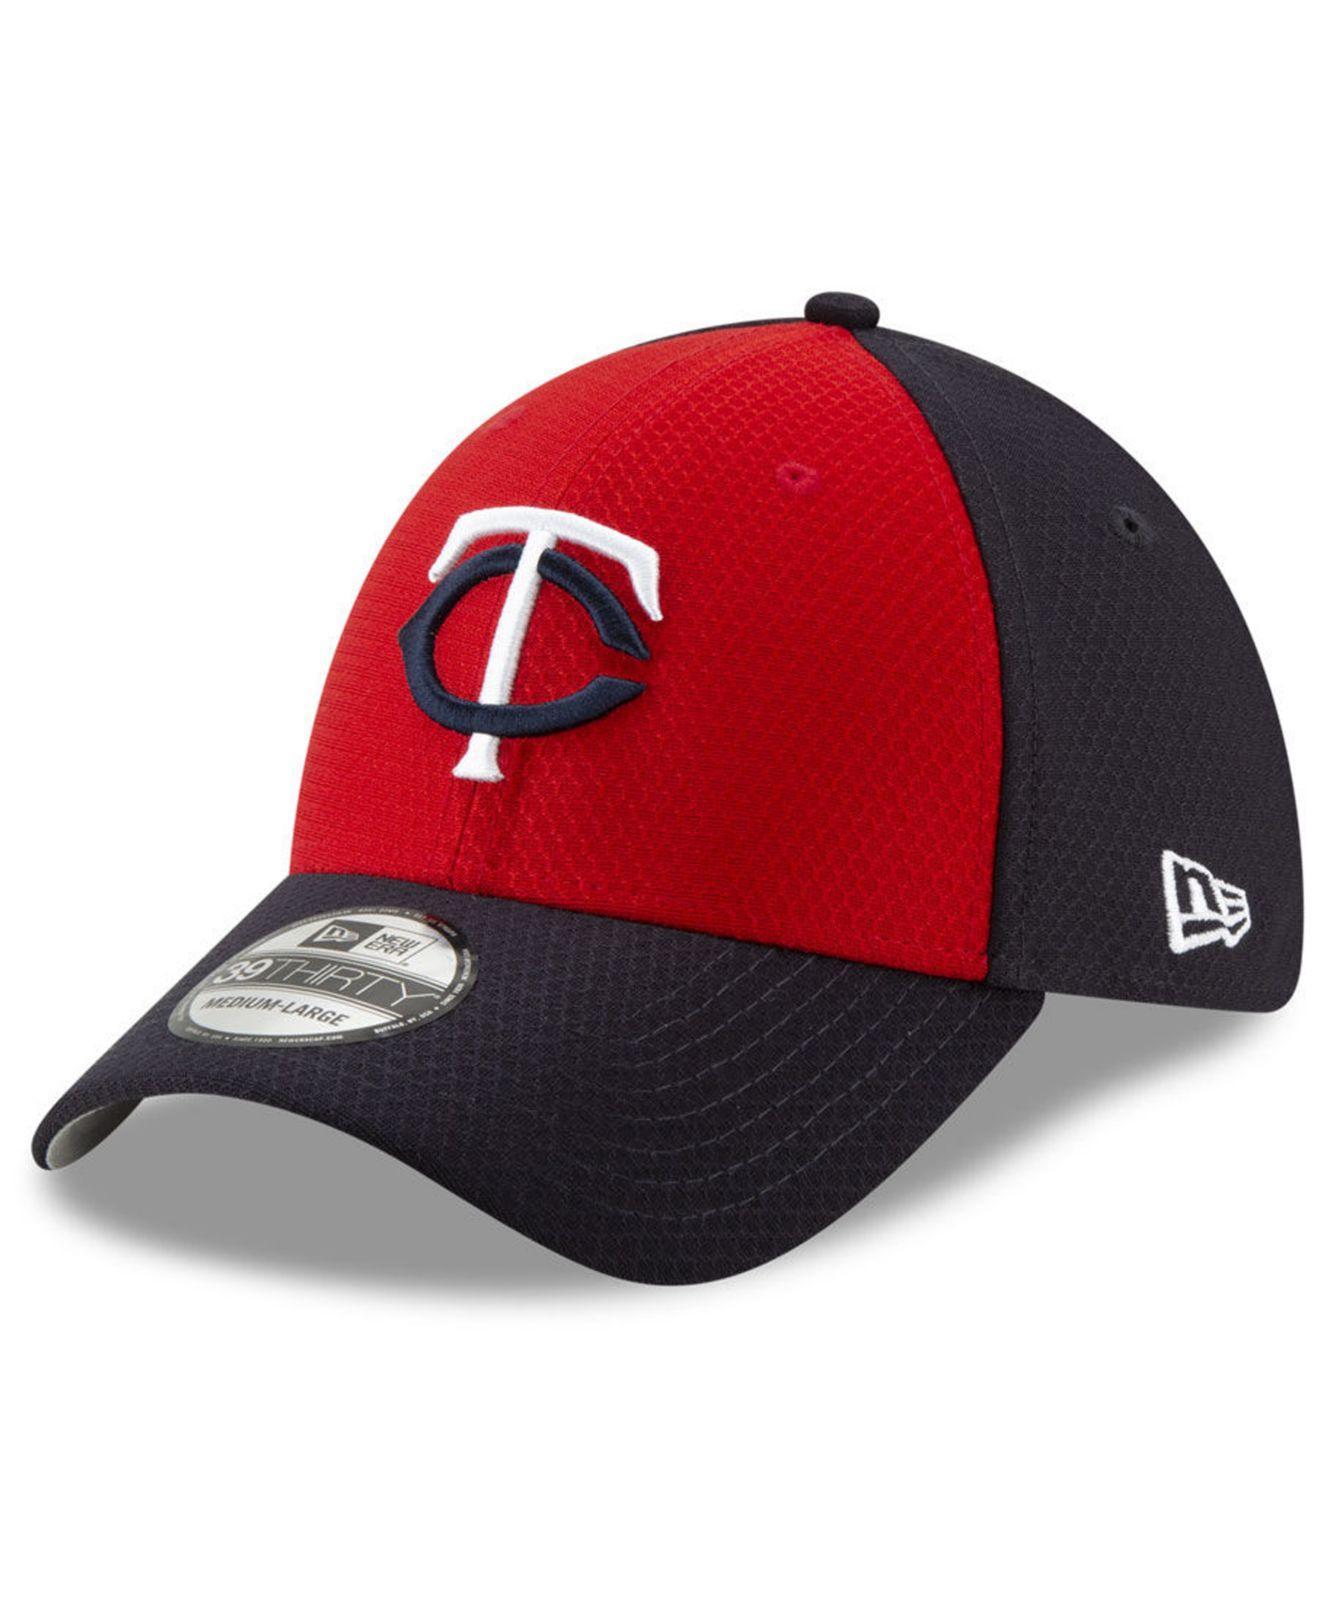 bd62f428 KTZ - Red Minnesota Twins Batting Practice 39thirty Cap for Men - Lyst.  View fullscreen